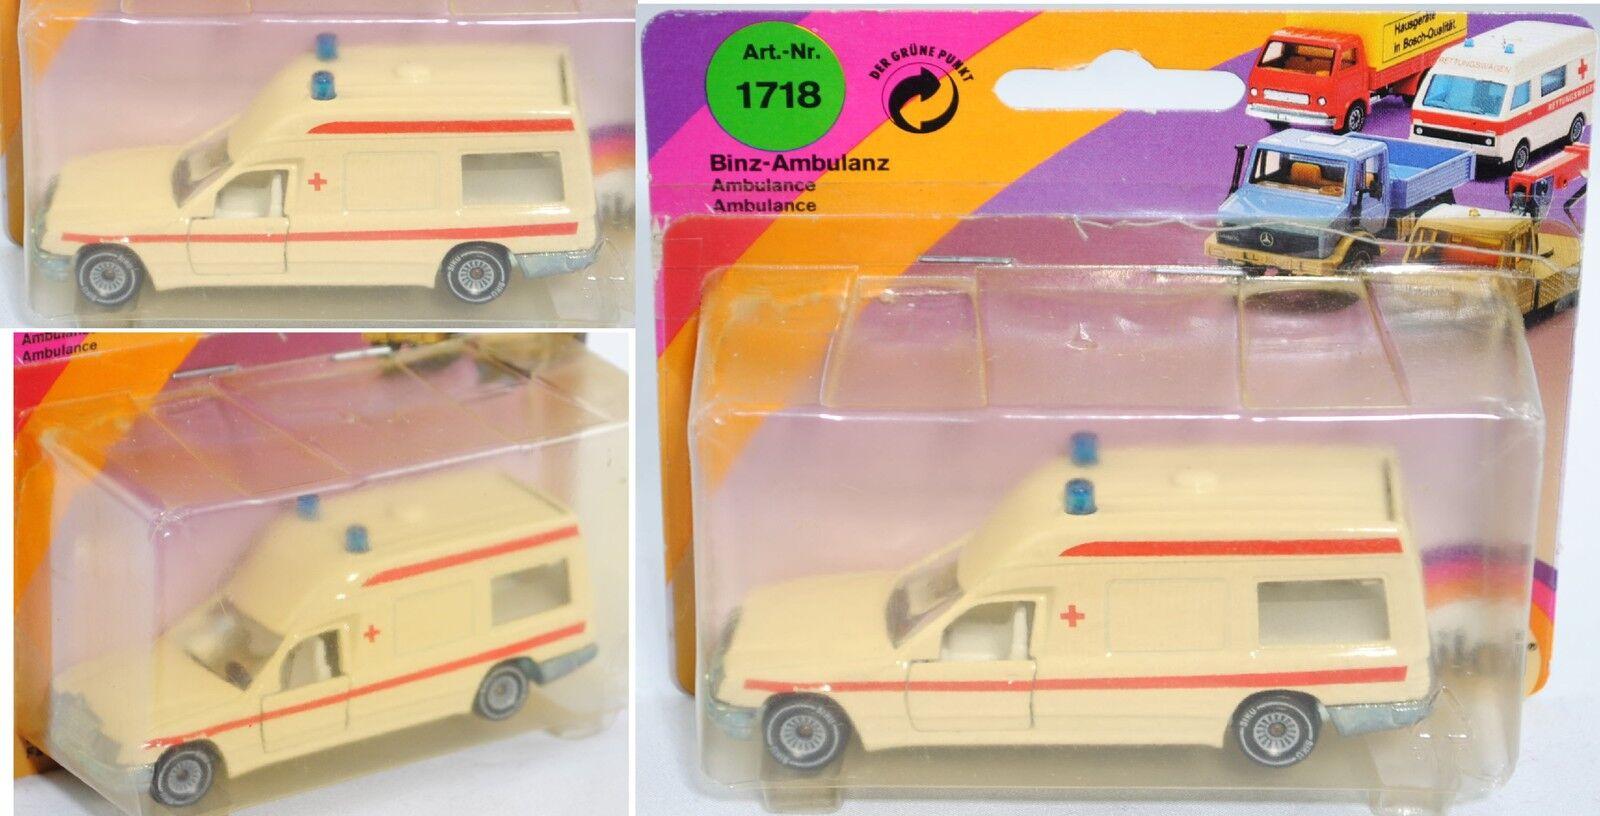 SIKU SUPER 1718 00001 MERCEDES-BENZ 260 E, Binz-Ambulance, environ 1 56